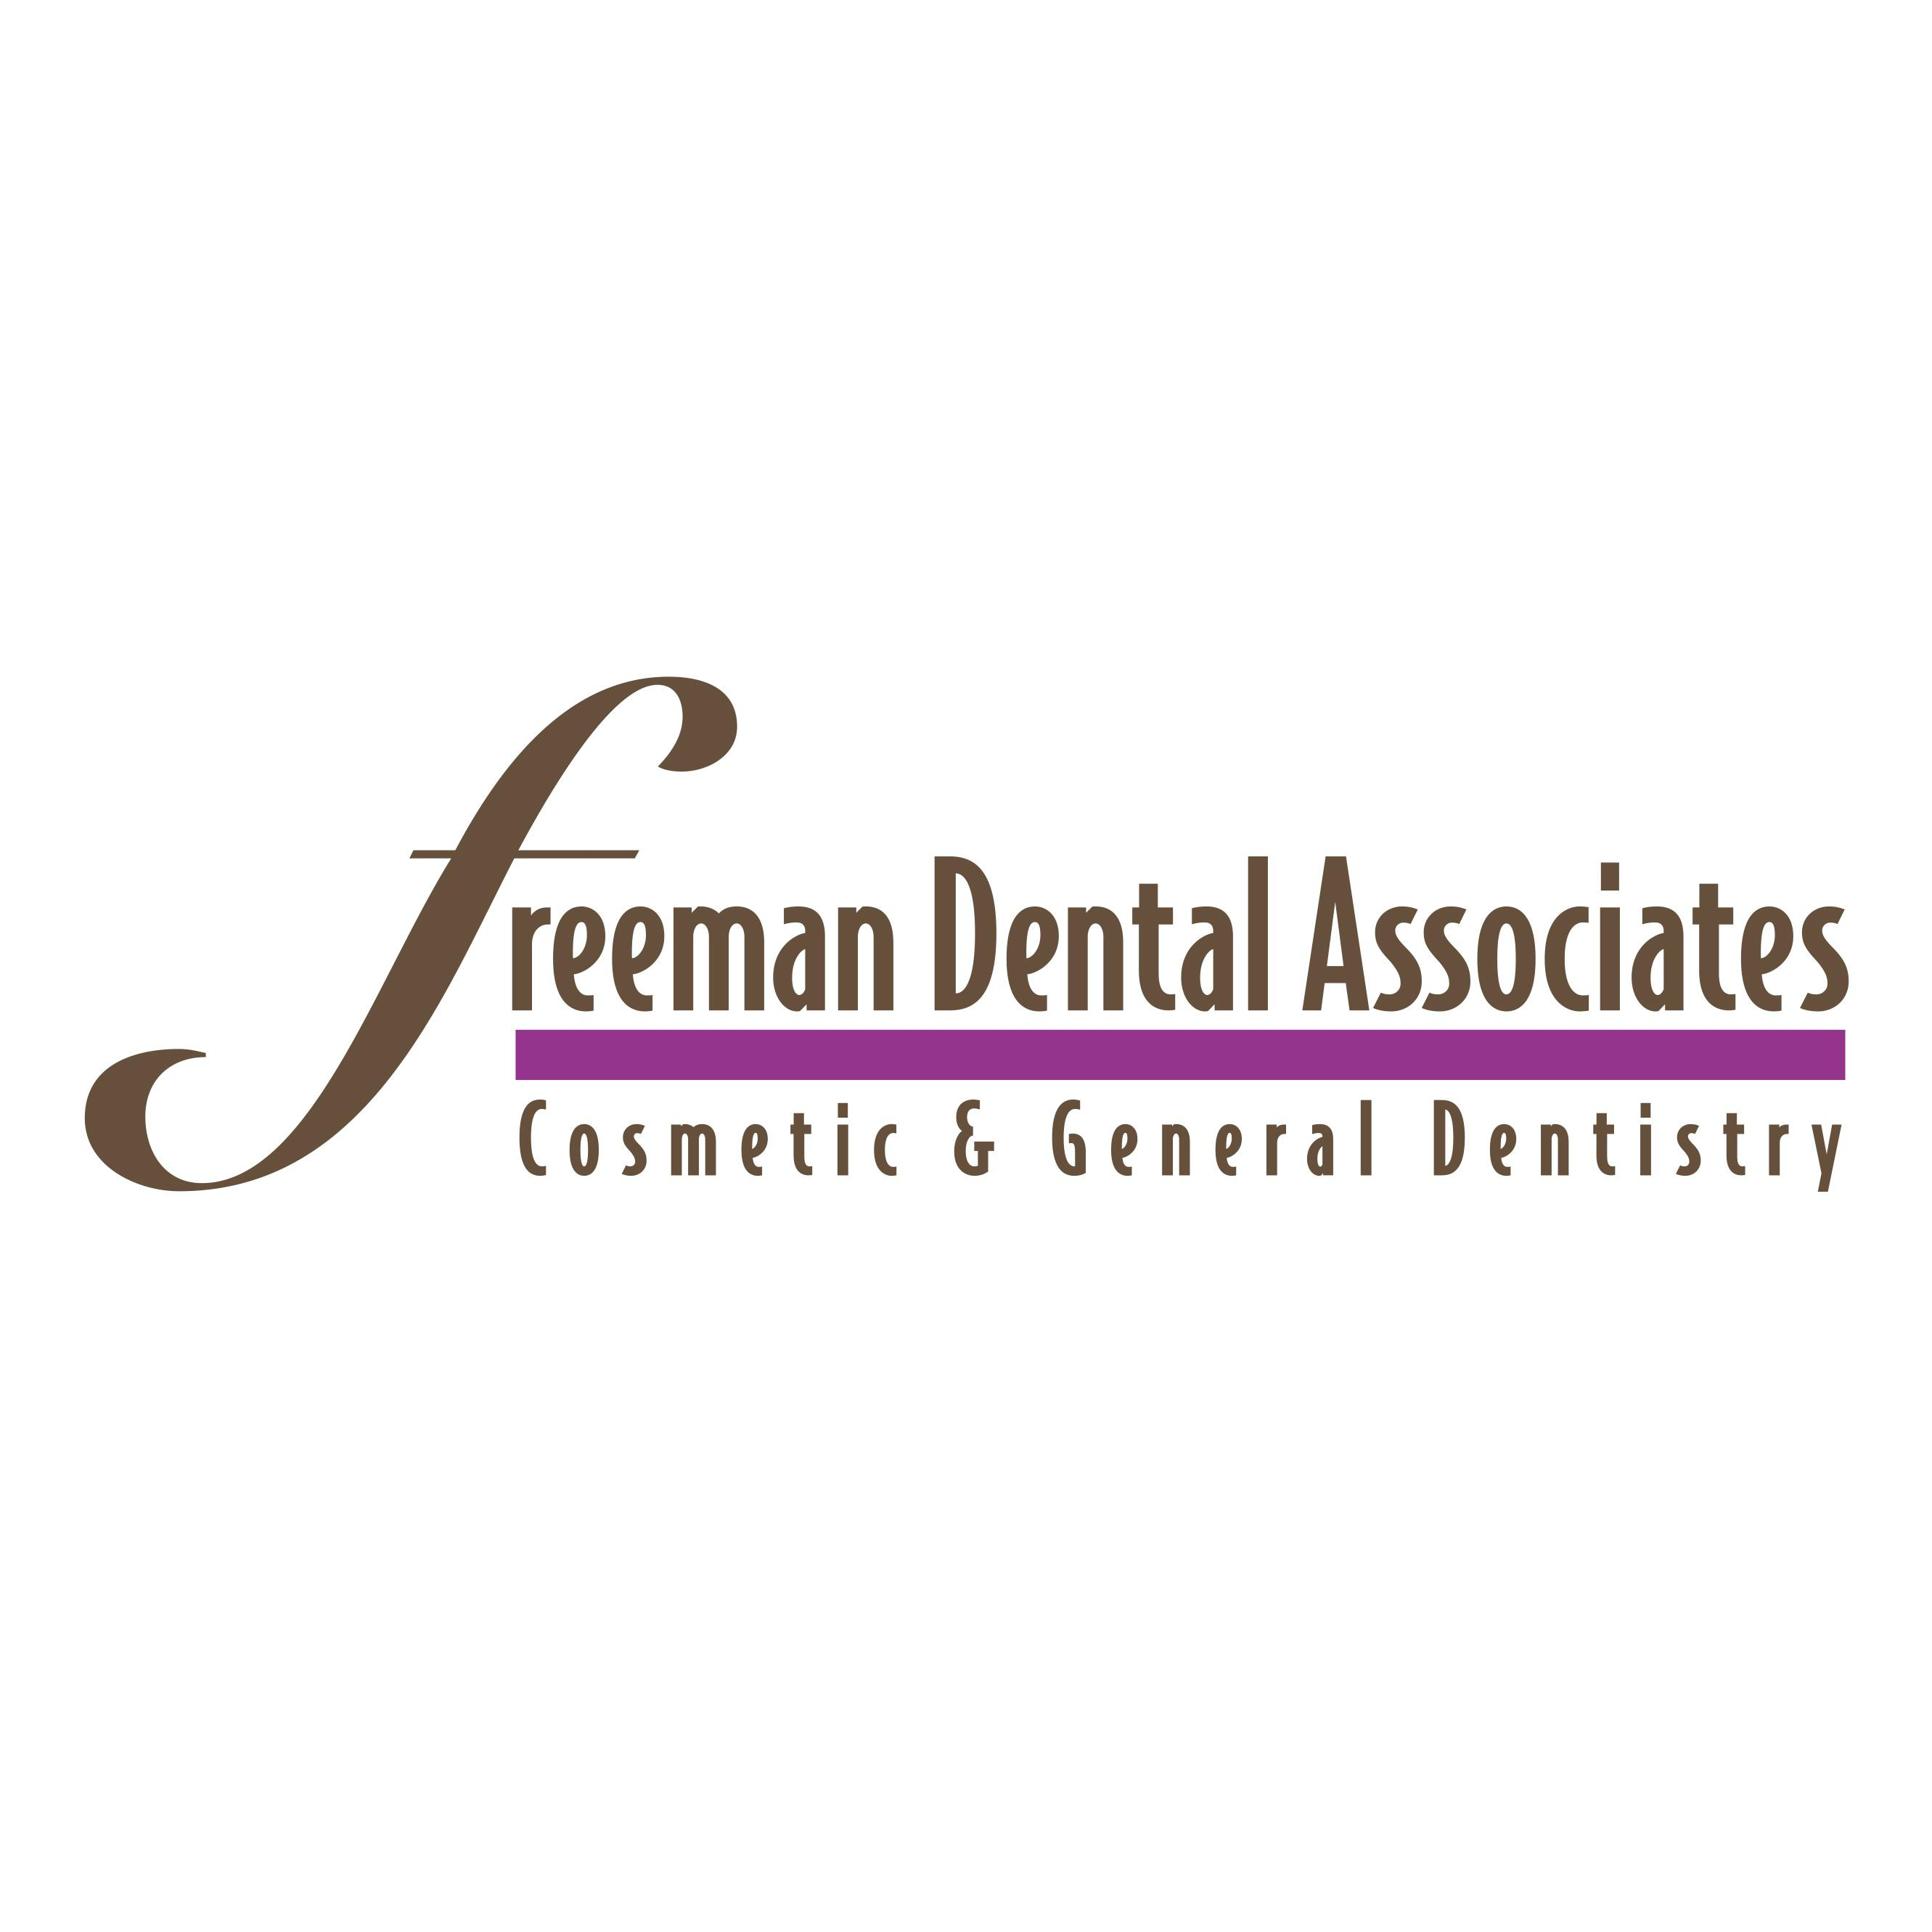 Freeman Dental Associates